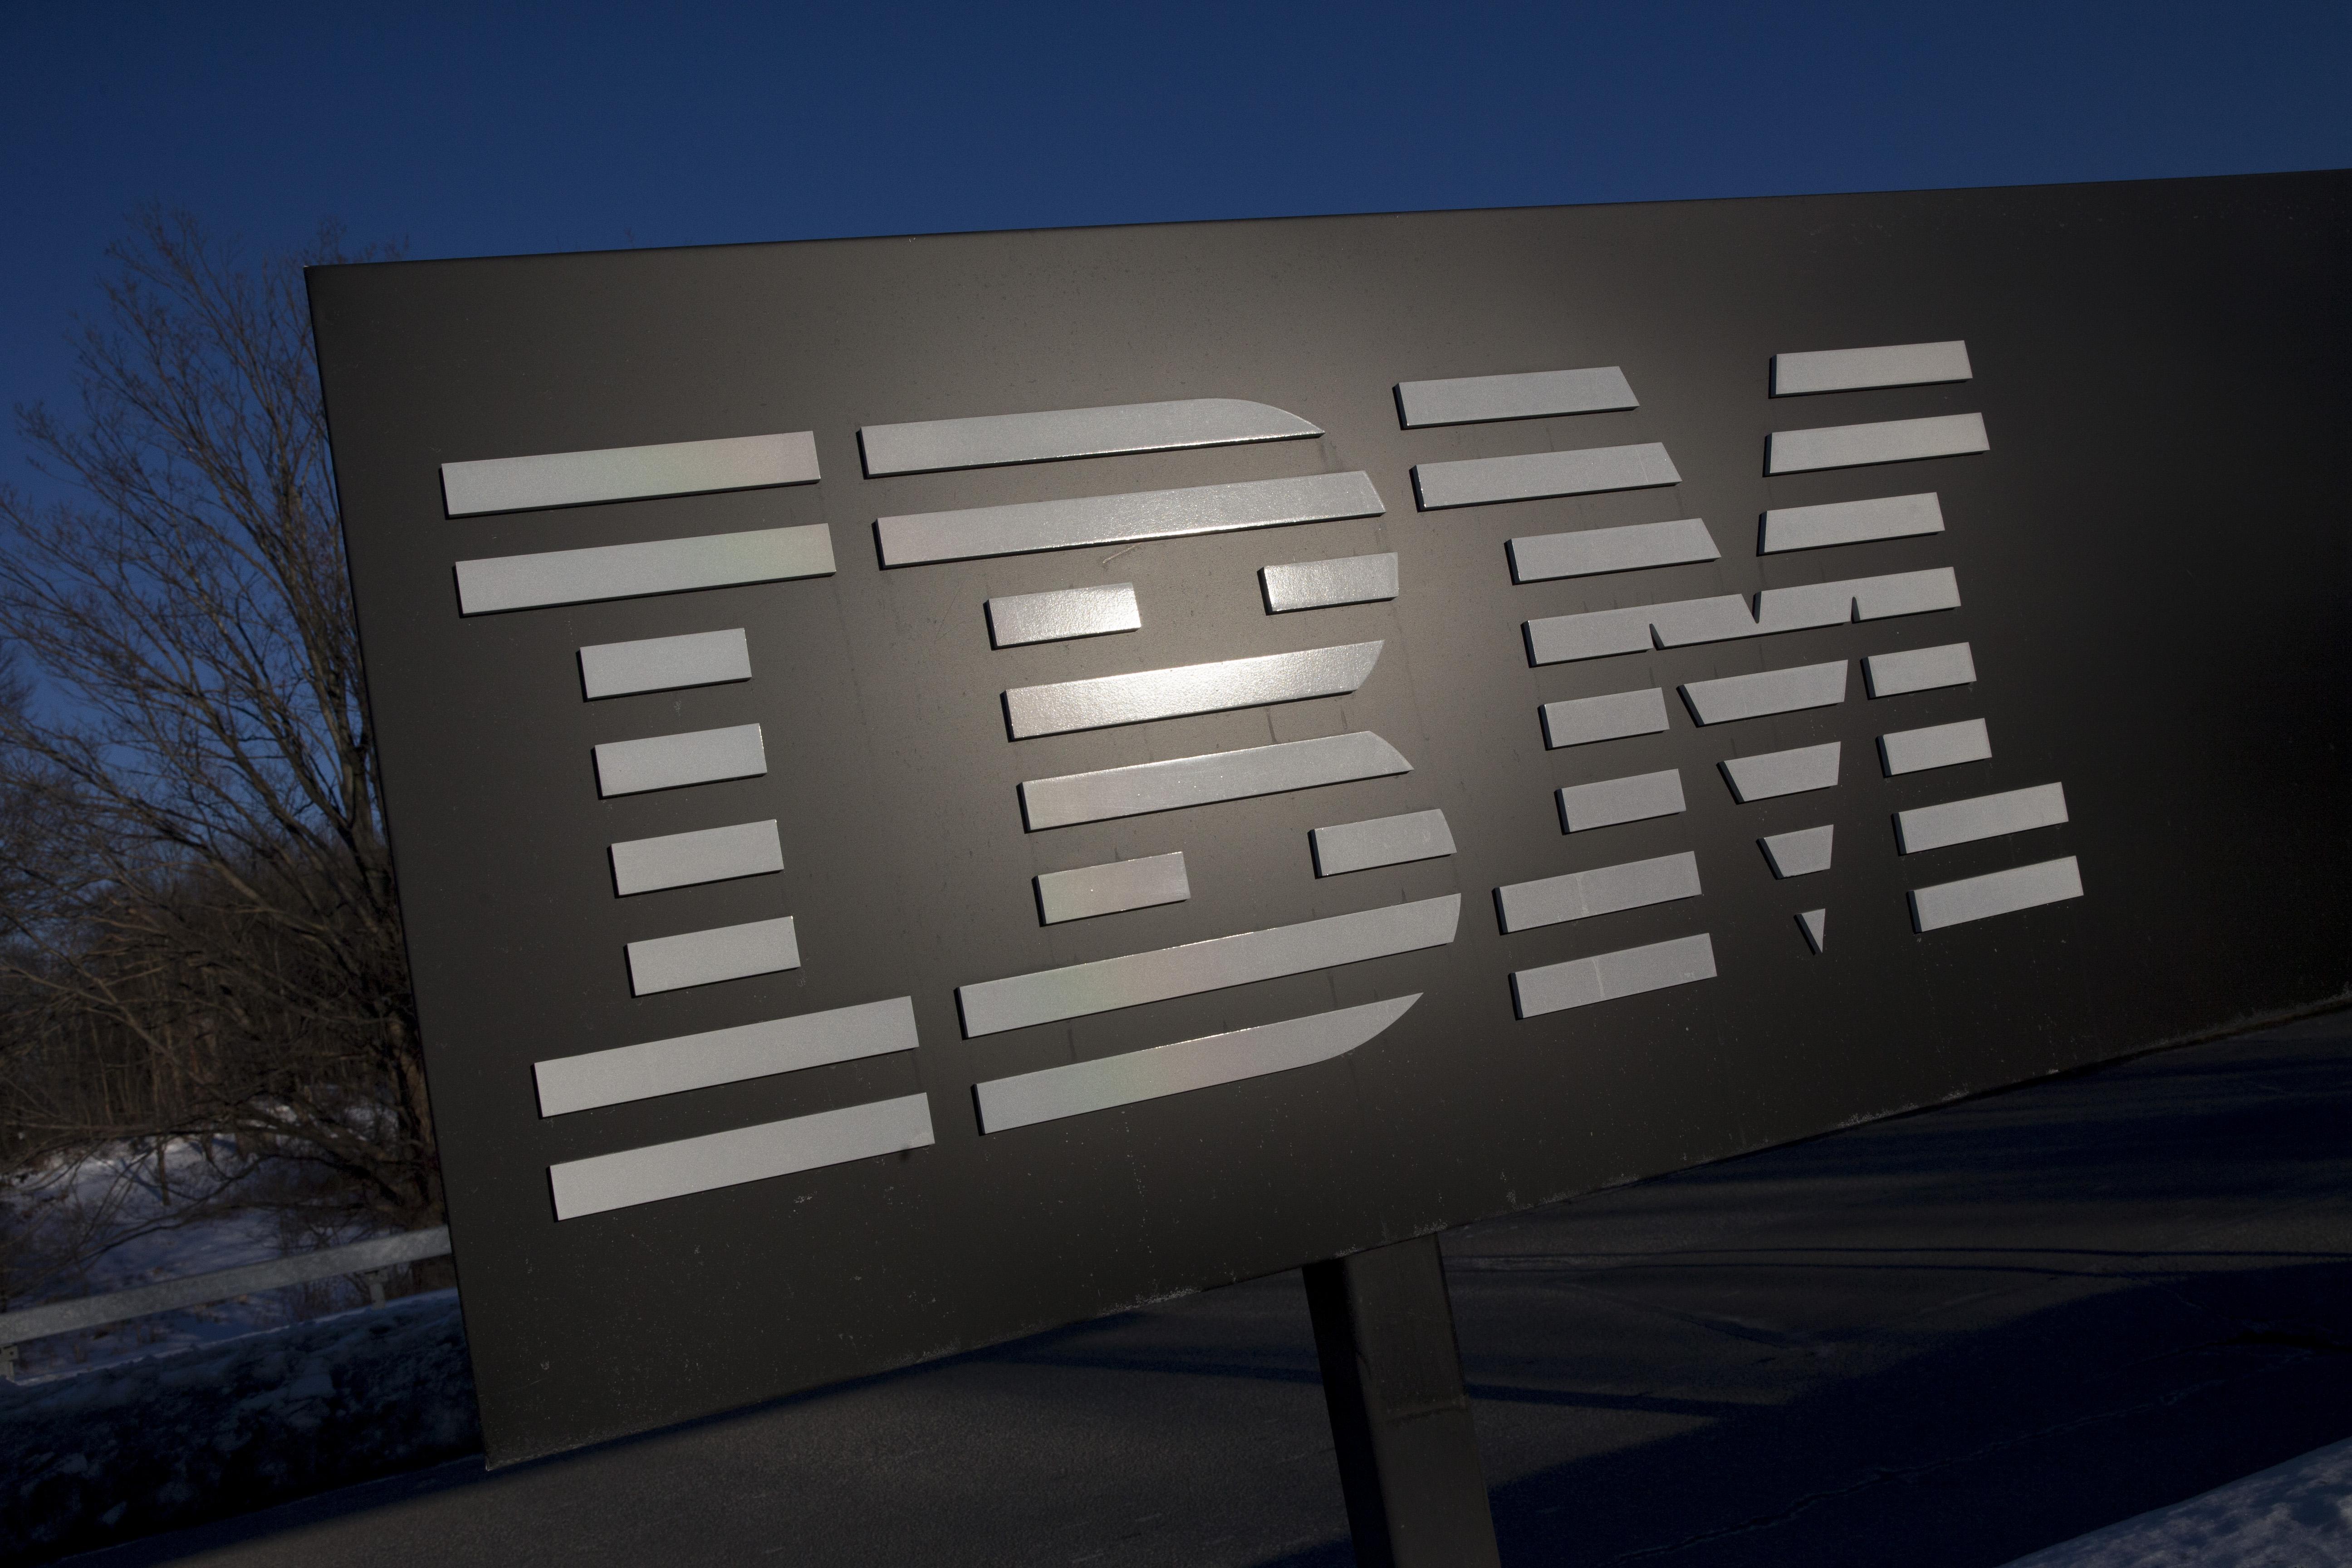 Inside IBM Research Headquarters